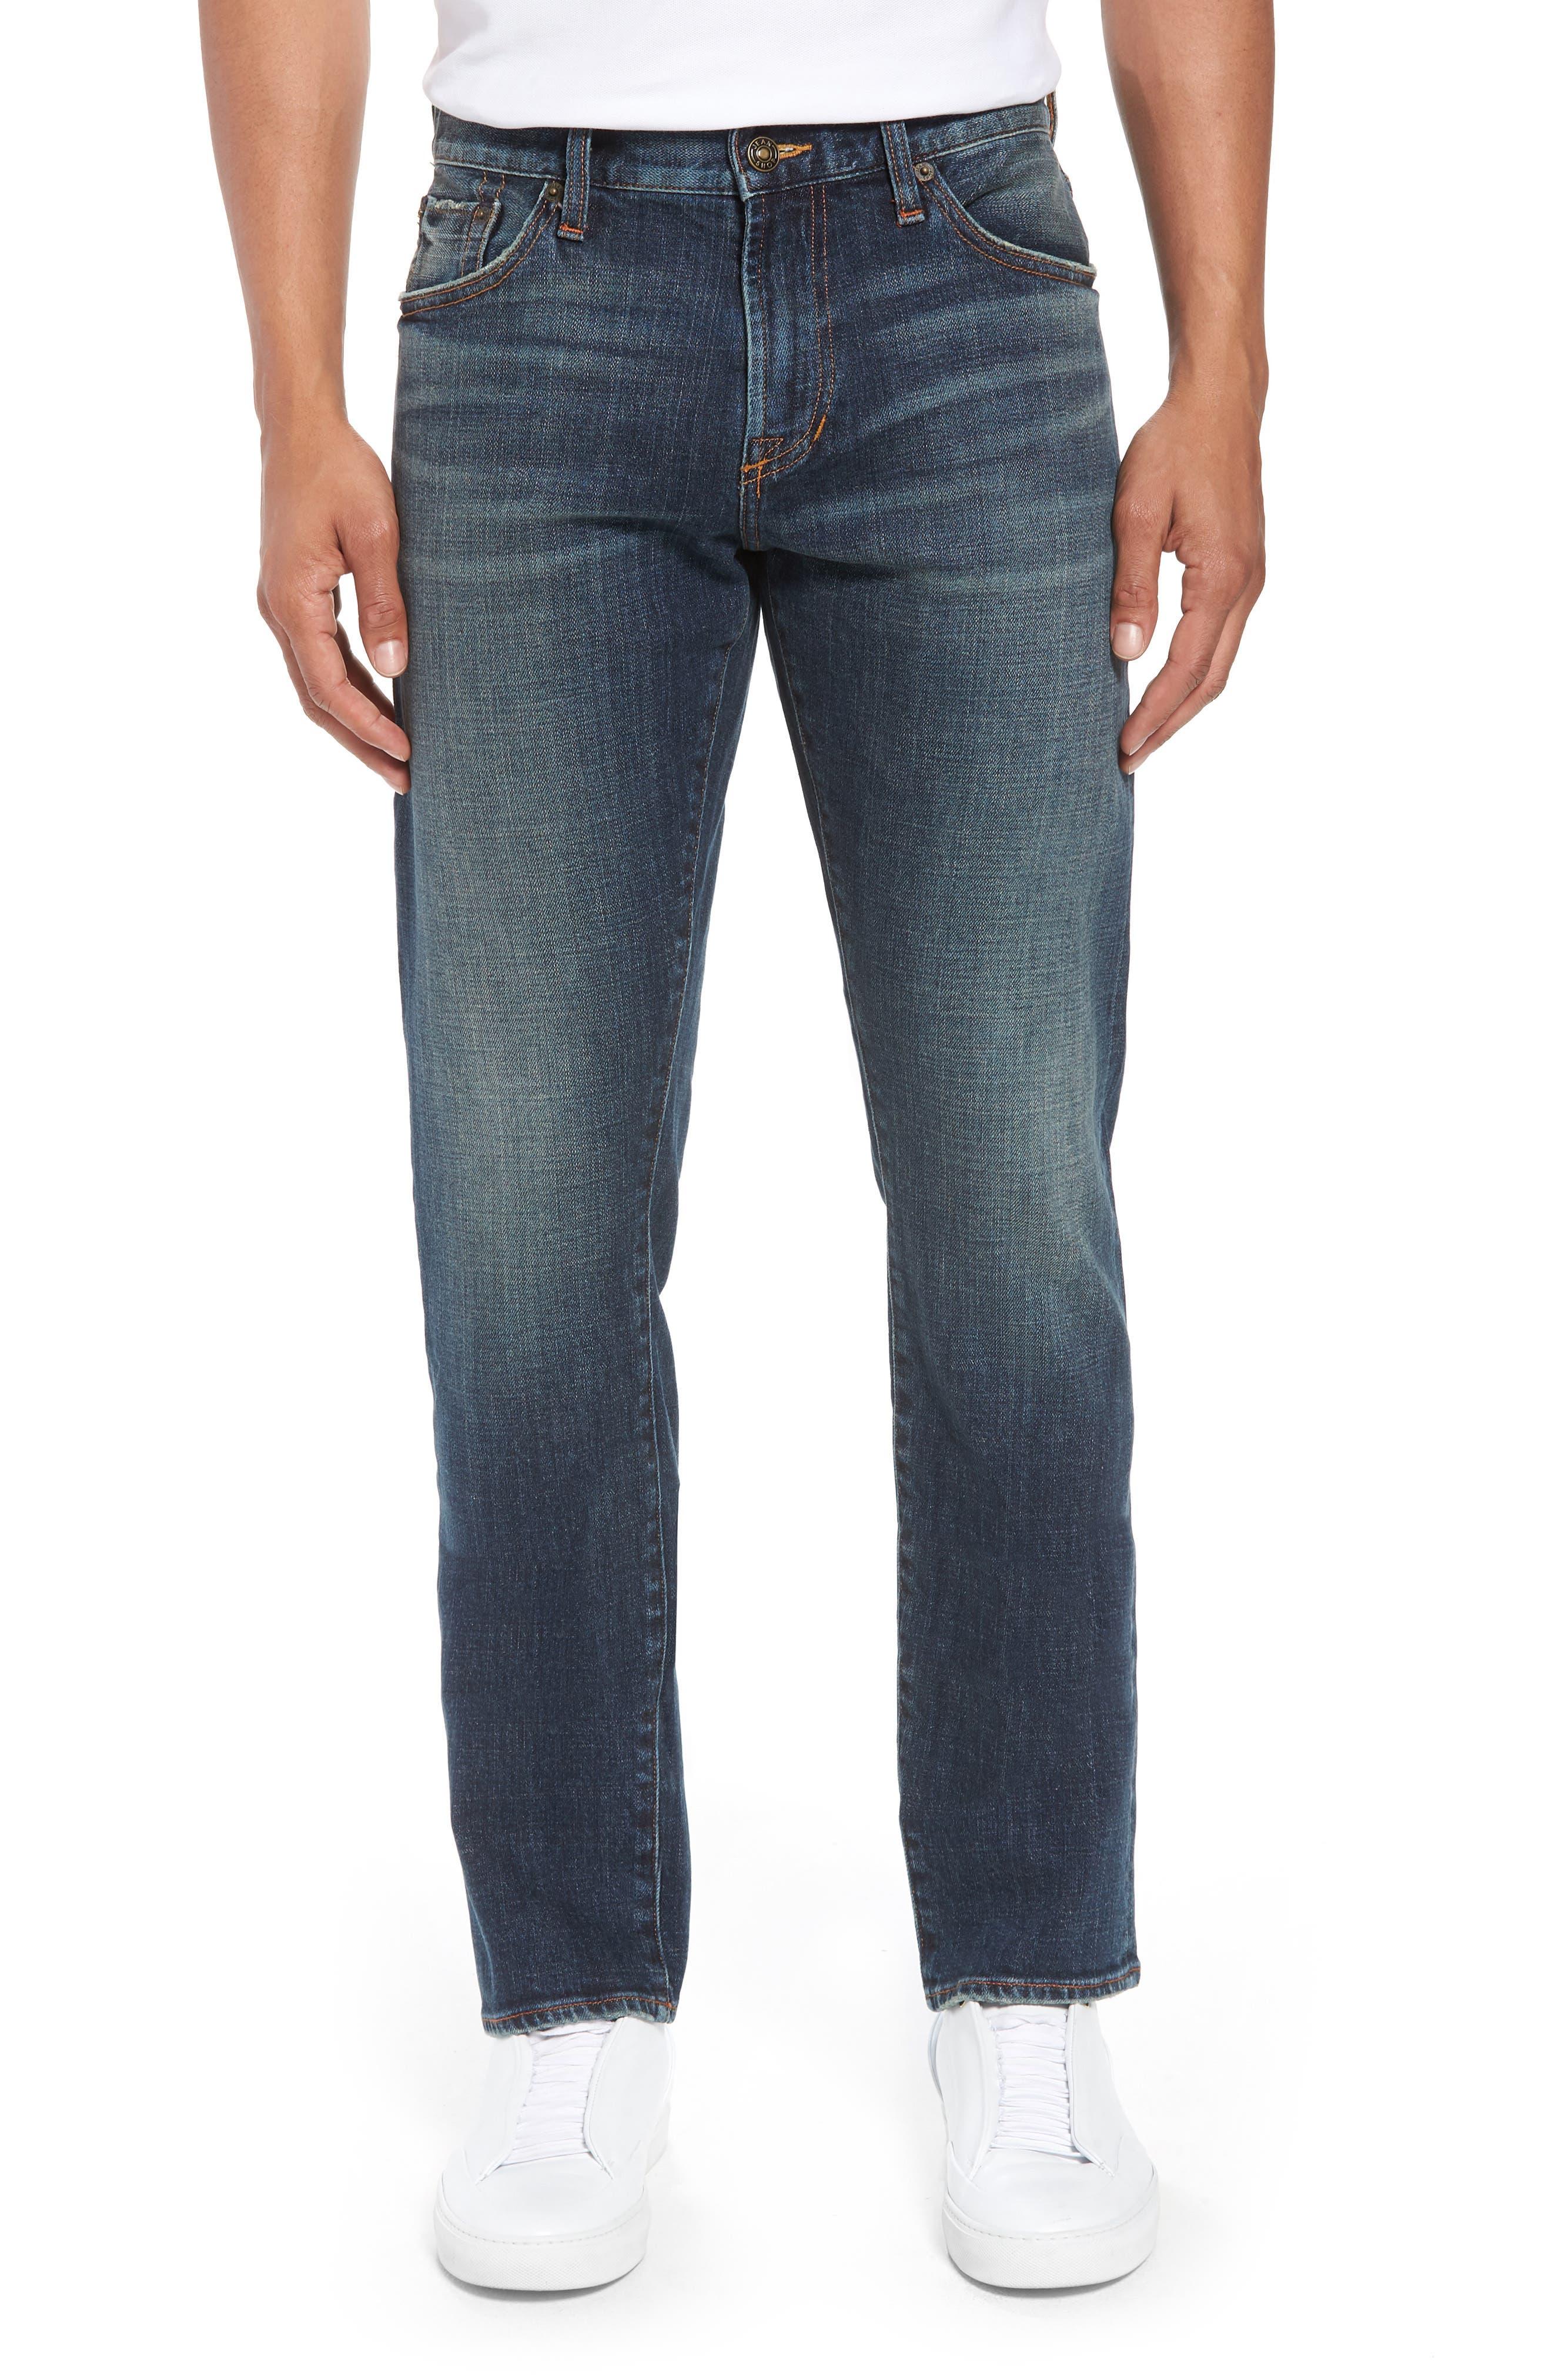 Mick Slim Straight Leg Jeans,                         Main,                         color, Filmore